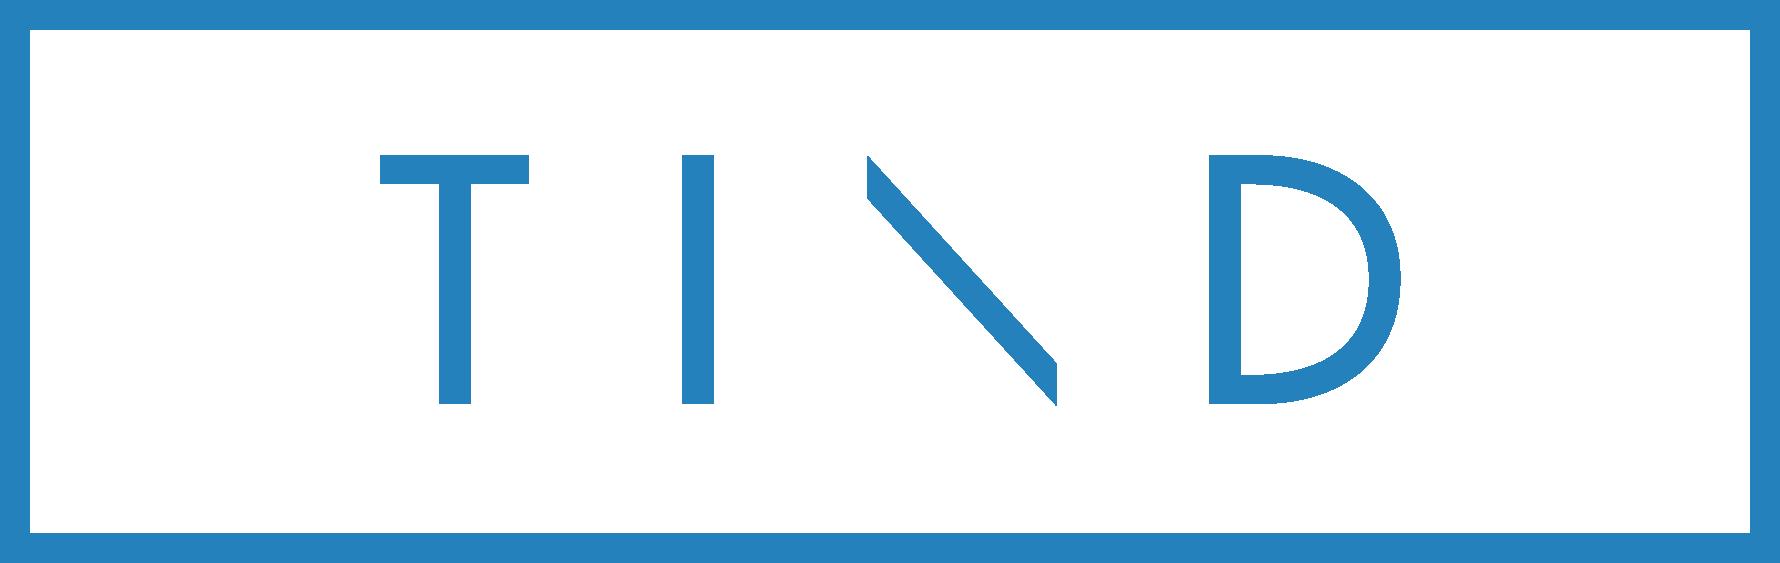 TIND_logo_blue-01-cropped